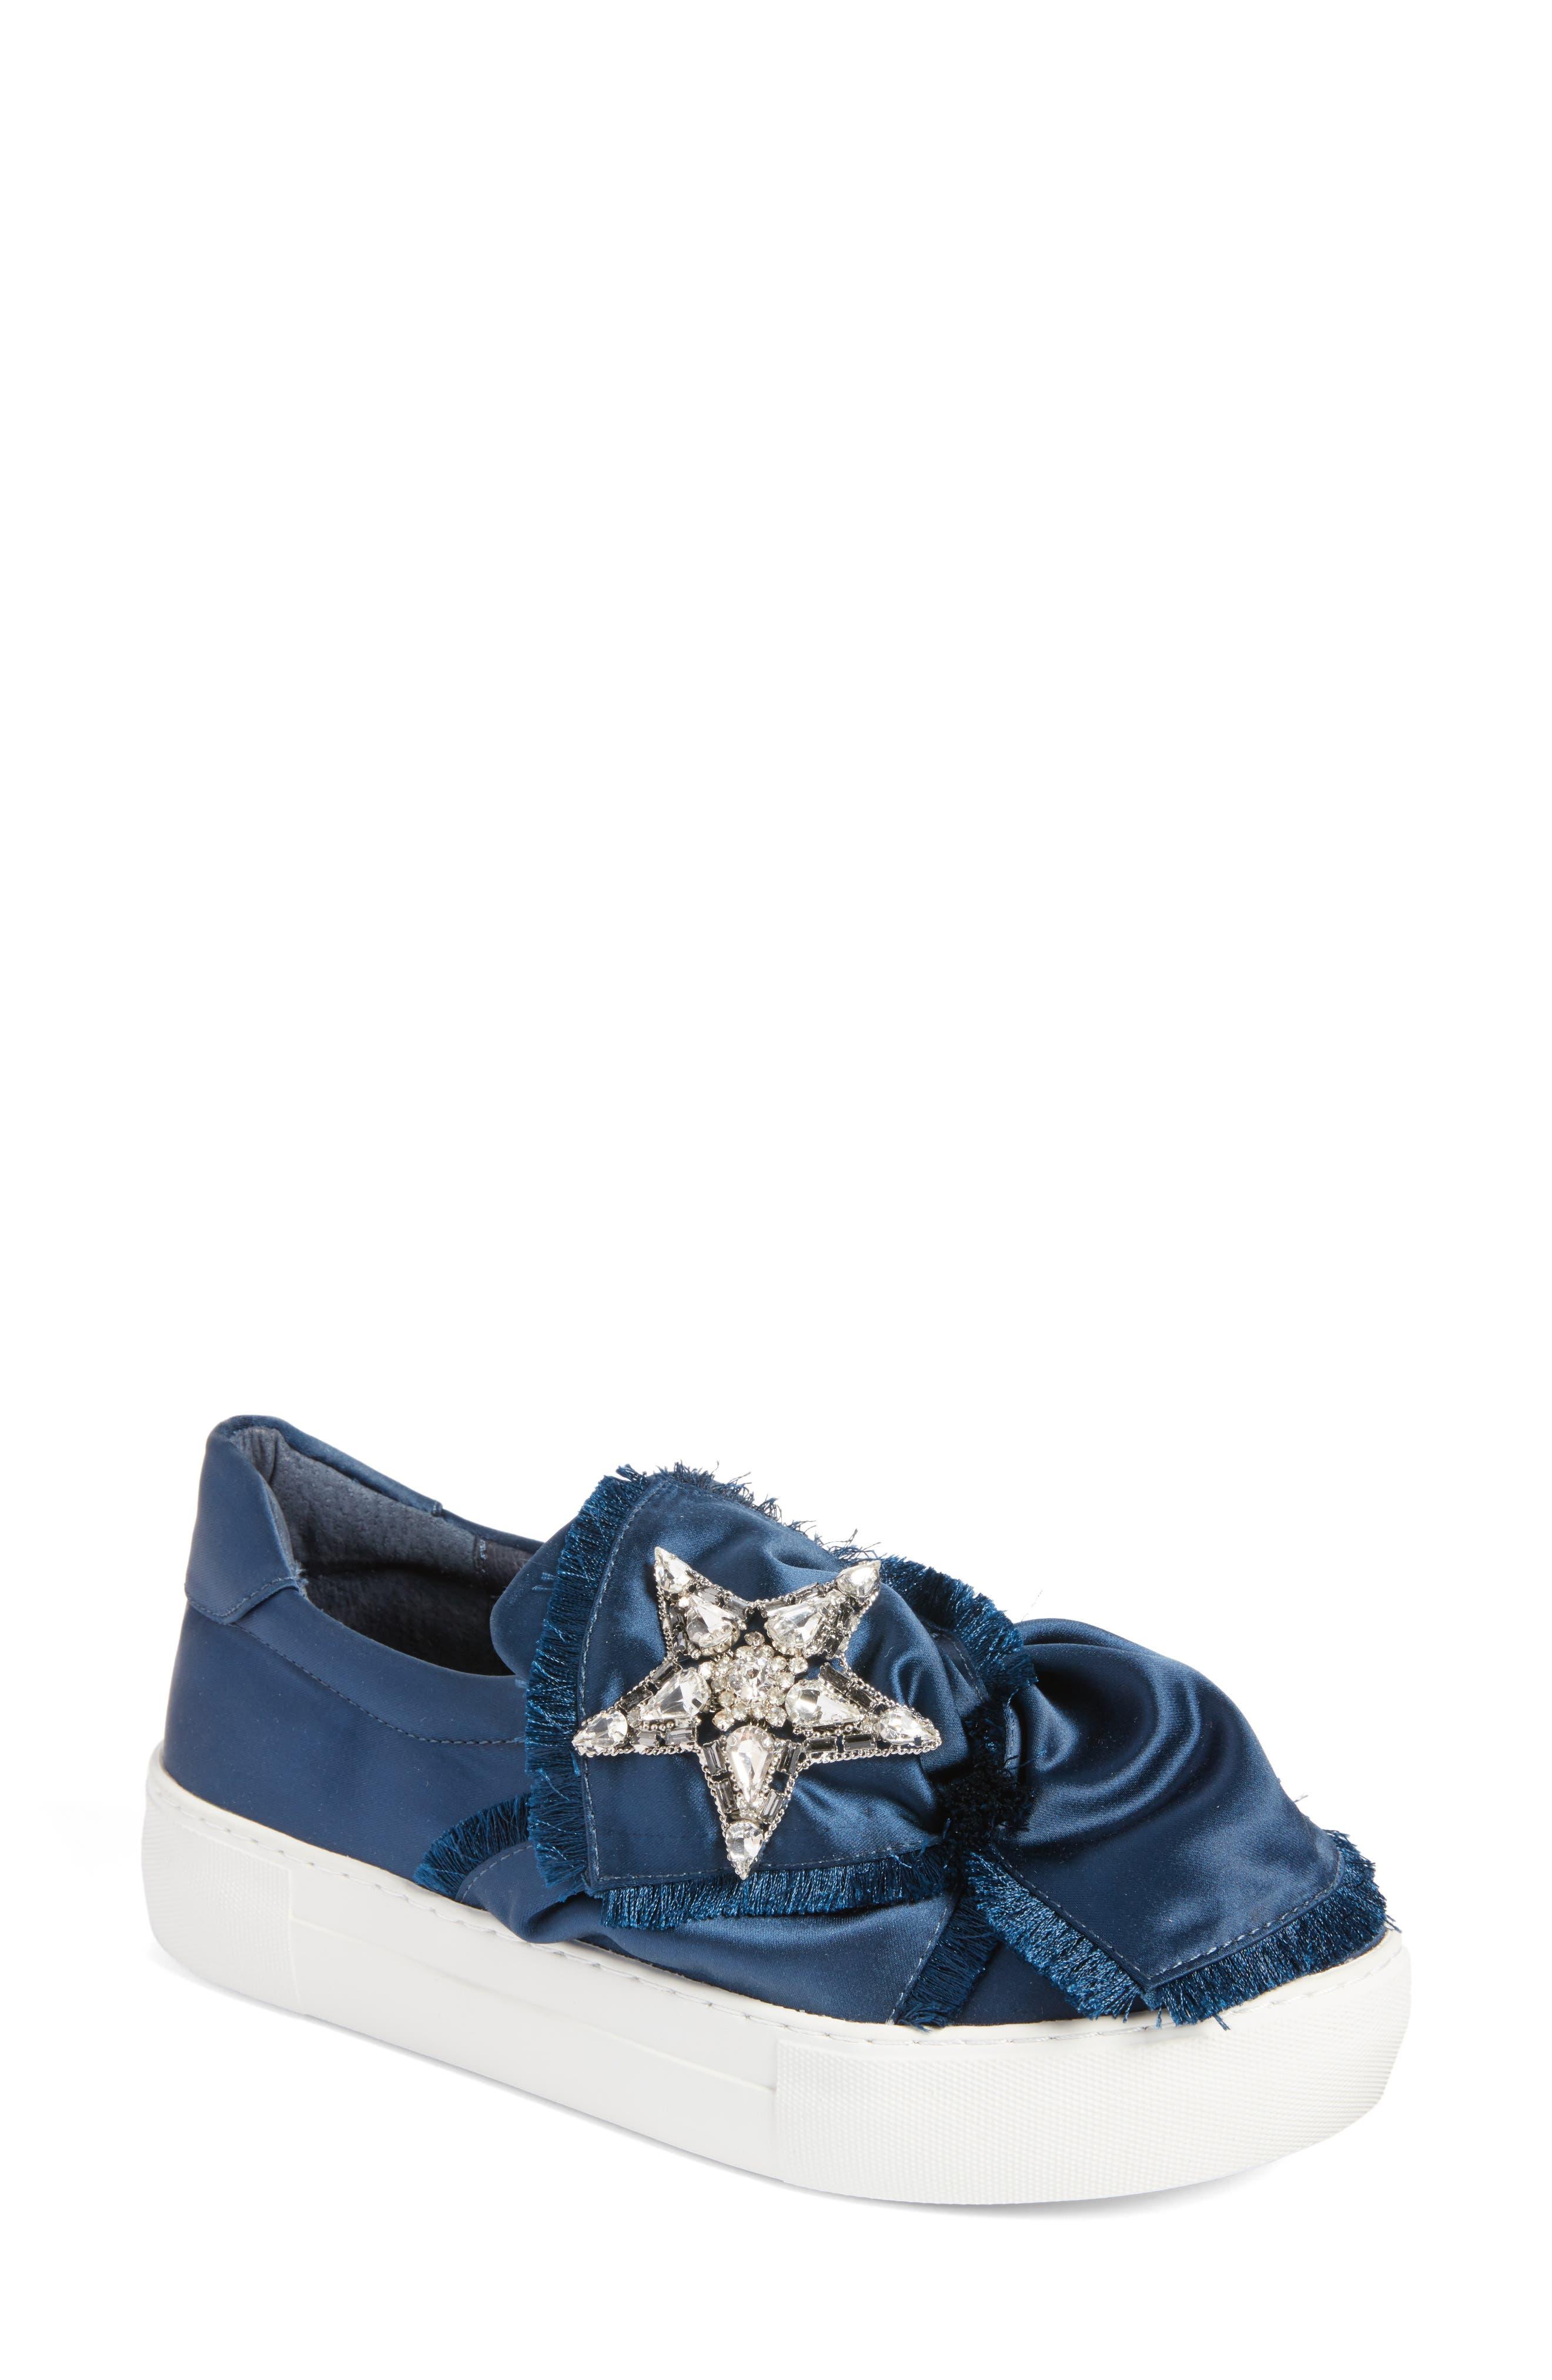 Astor Slip-On Sneaker,                         Main,                         color, Navy Satin